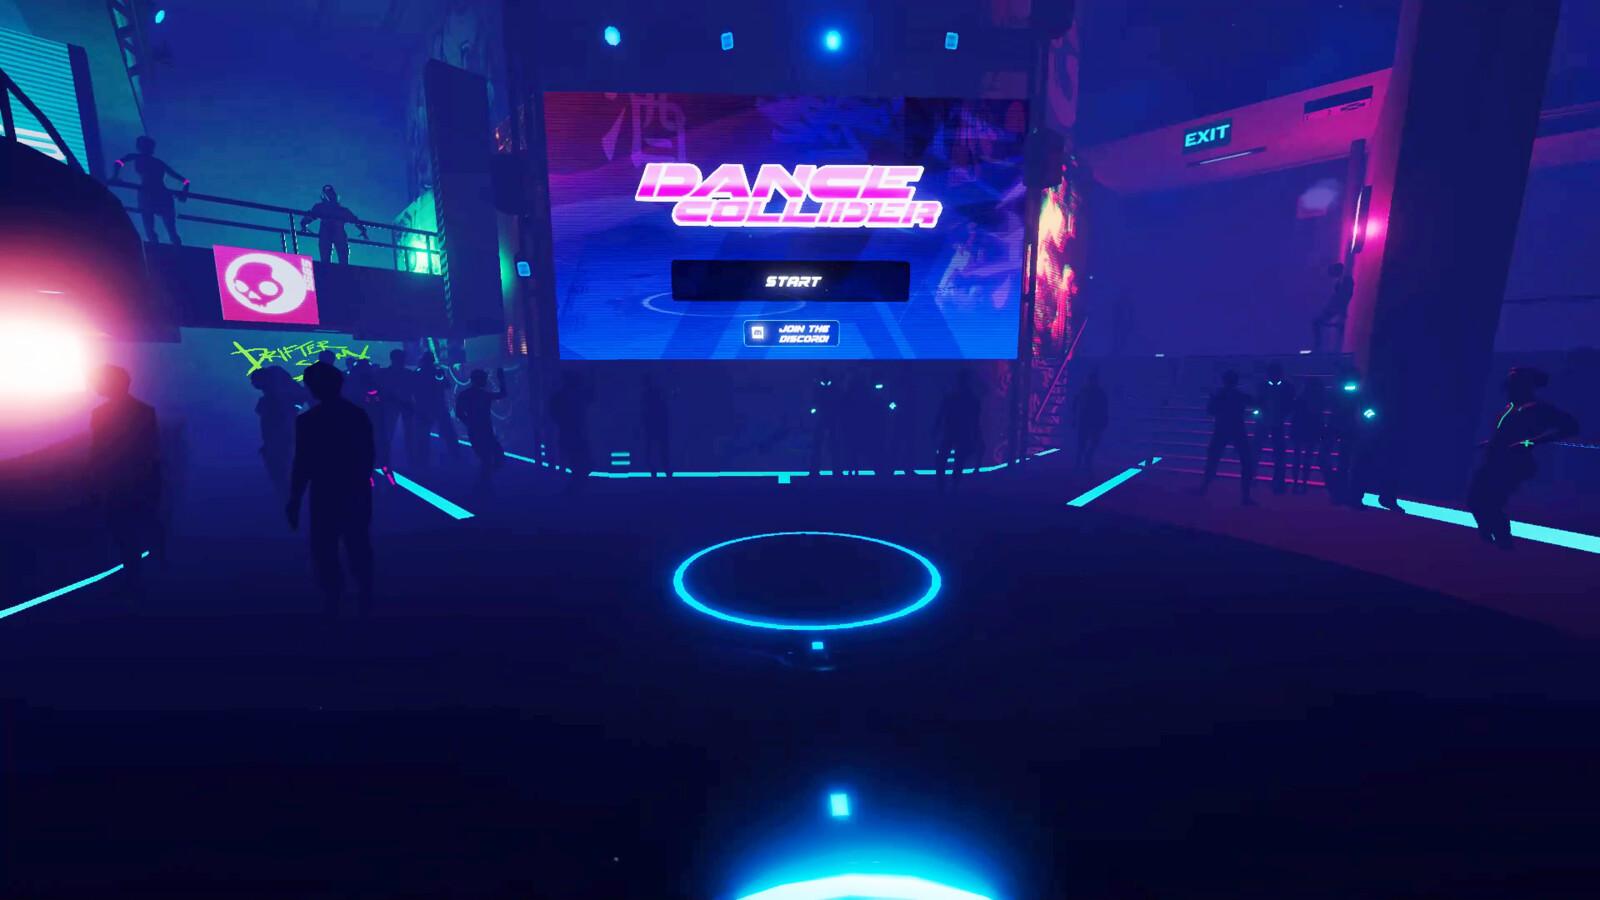 Dance Collider lobby